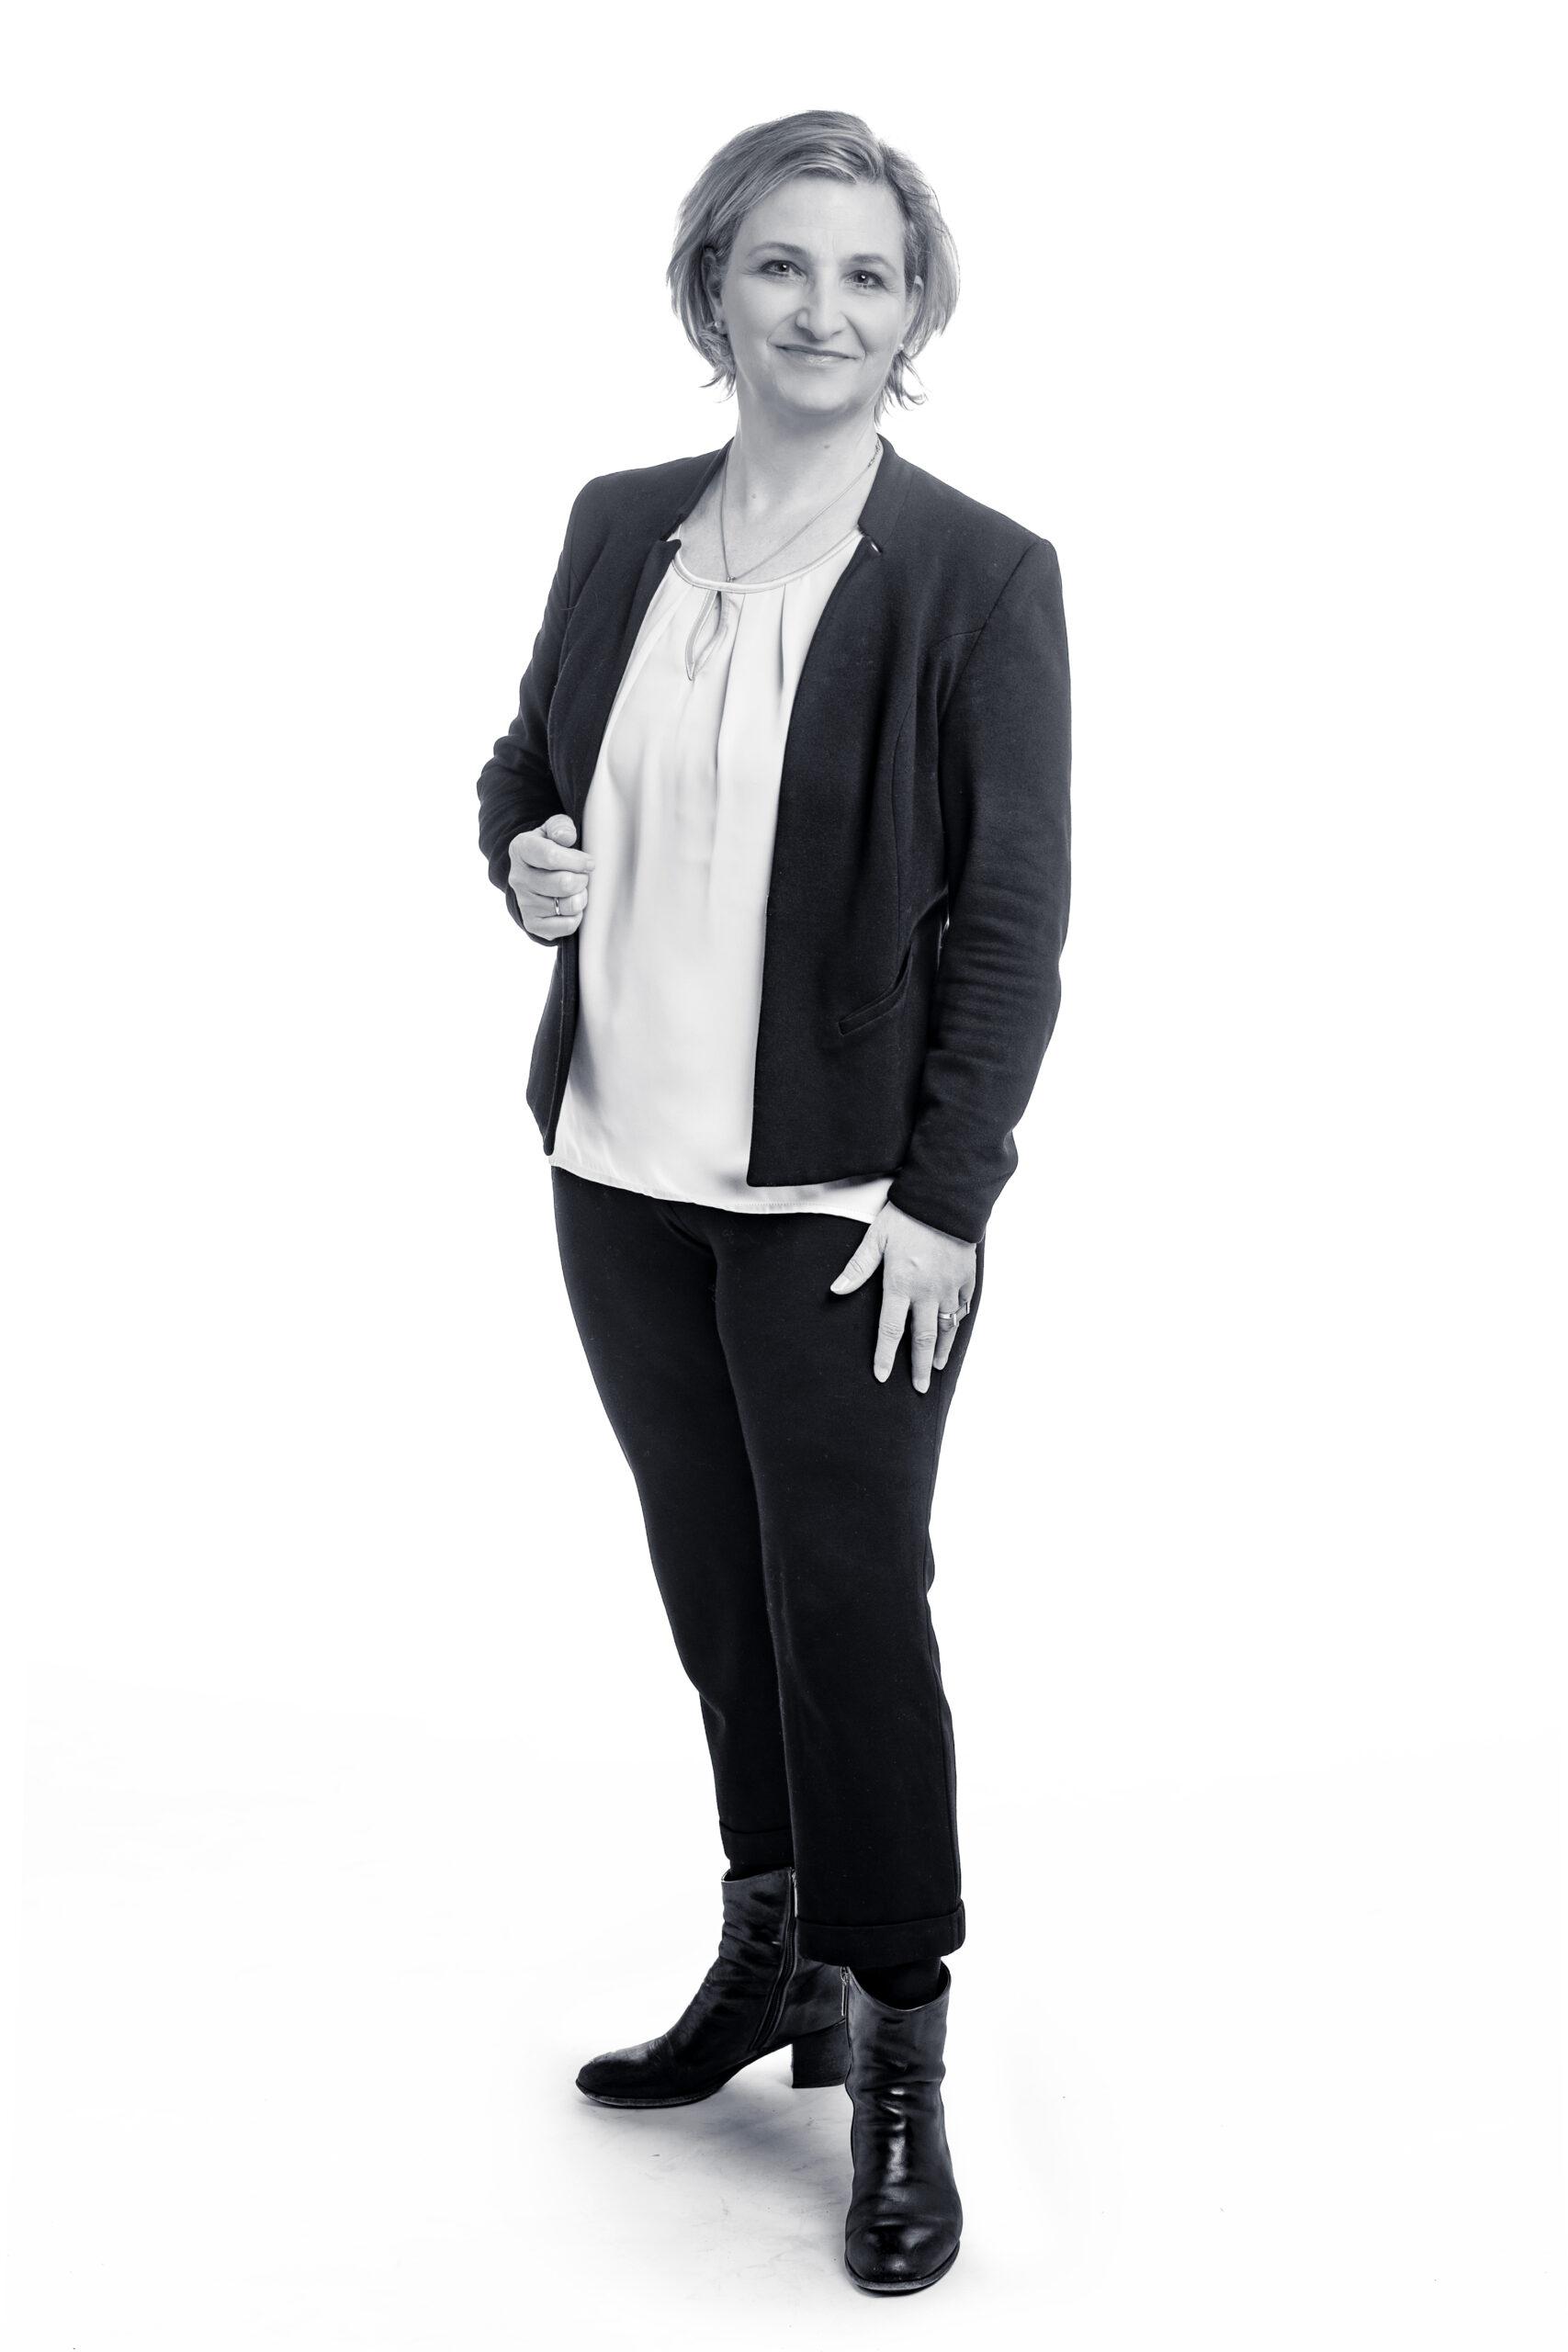 Dorothea Fichter-Fechner